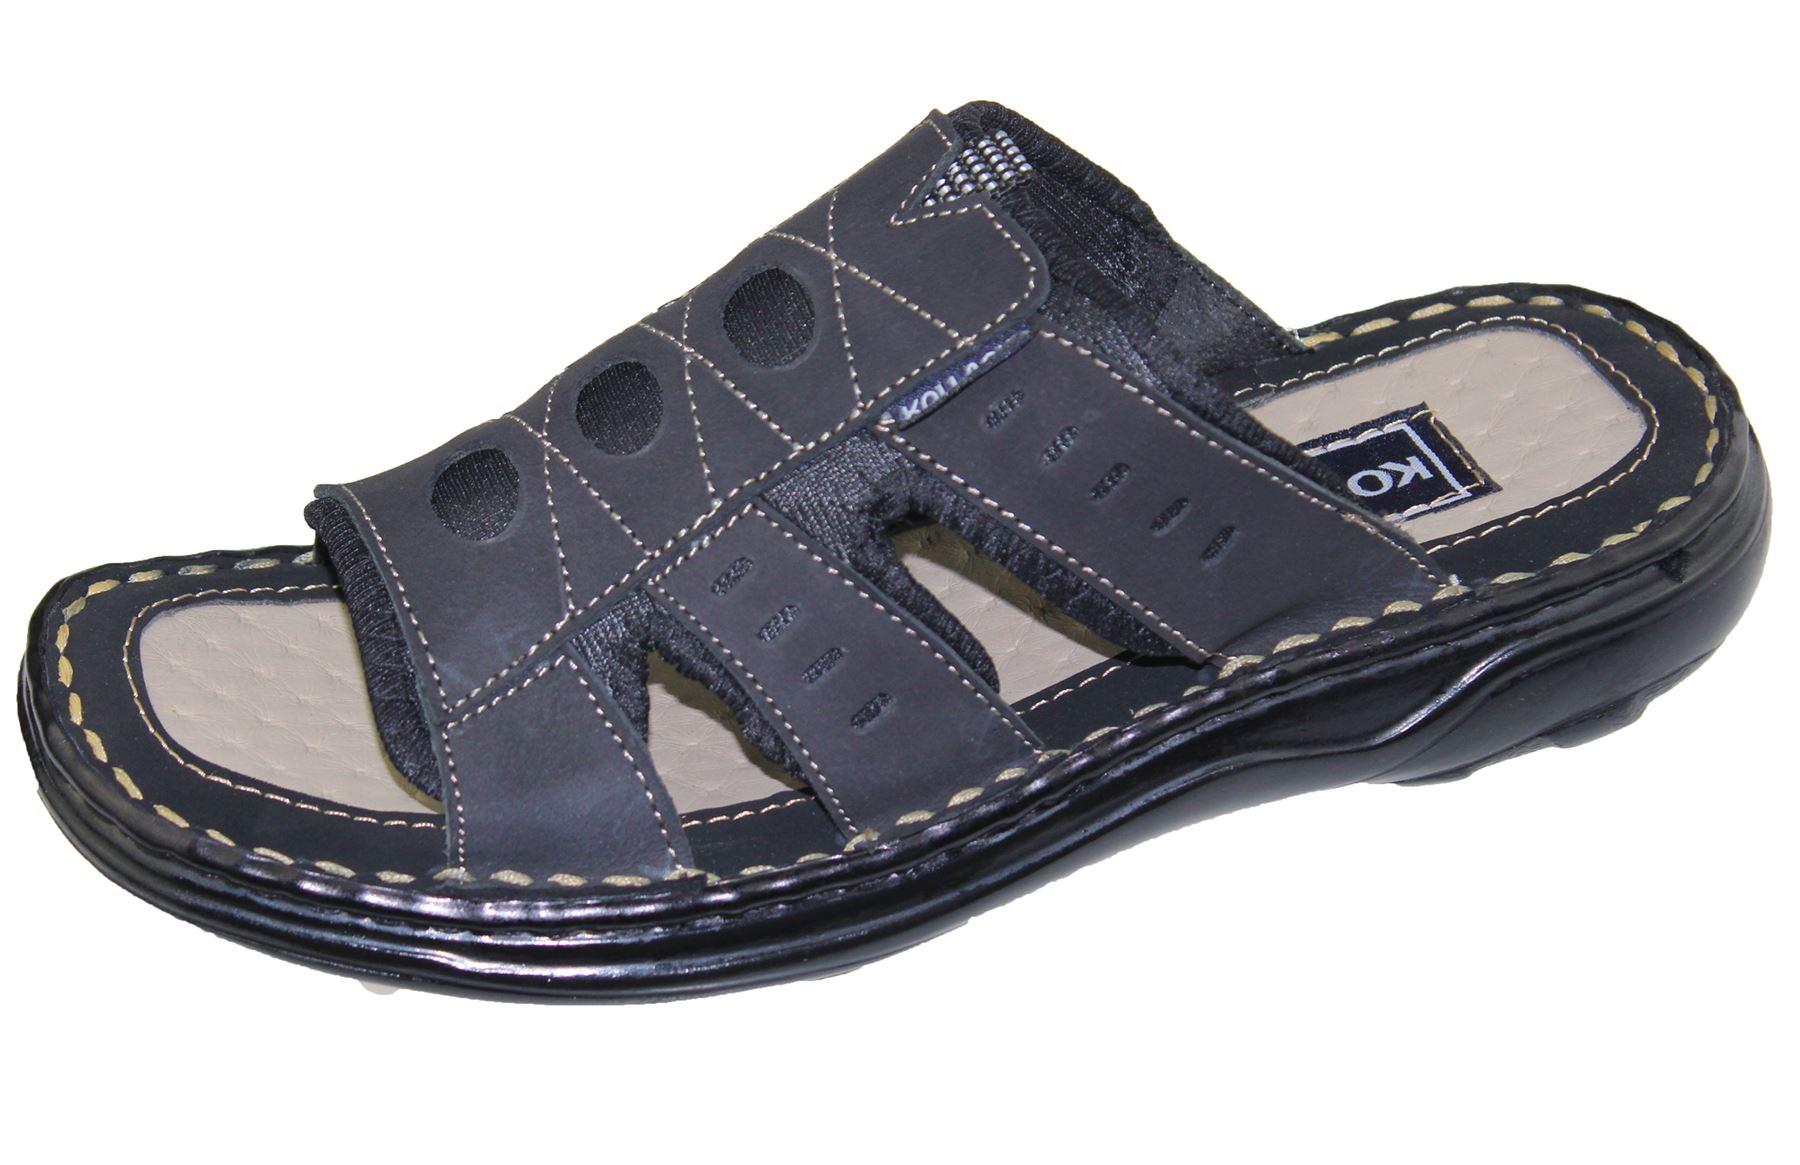 Mens-Slipper-Sandal-Sports-Beach-Buckle-Walking-Fashion-Summer-Casual-Shoes-Size miniatura 4